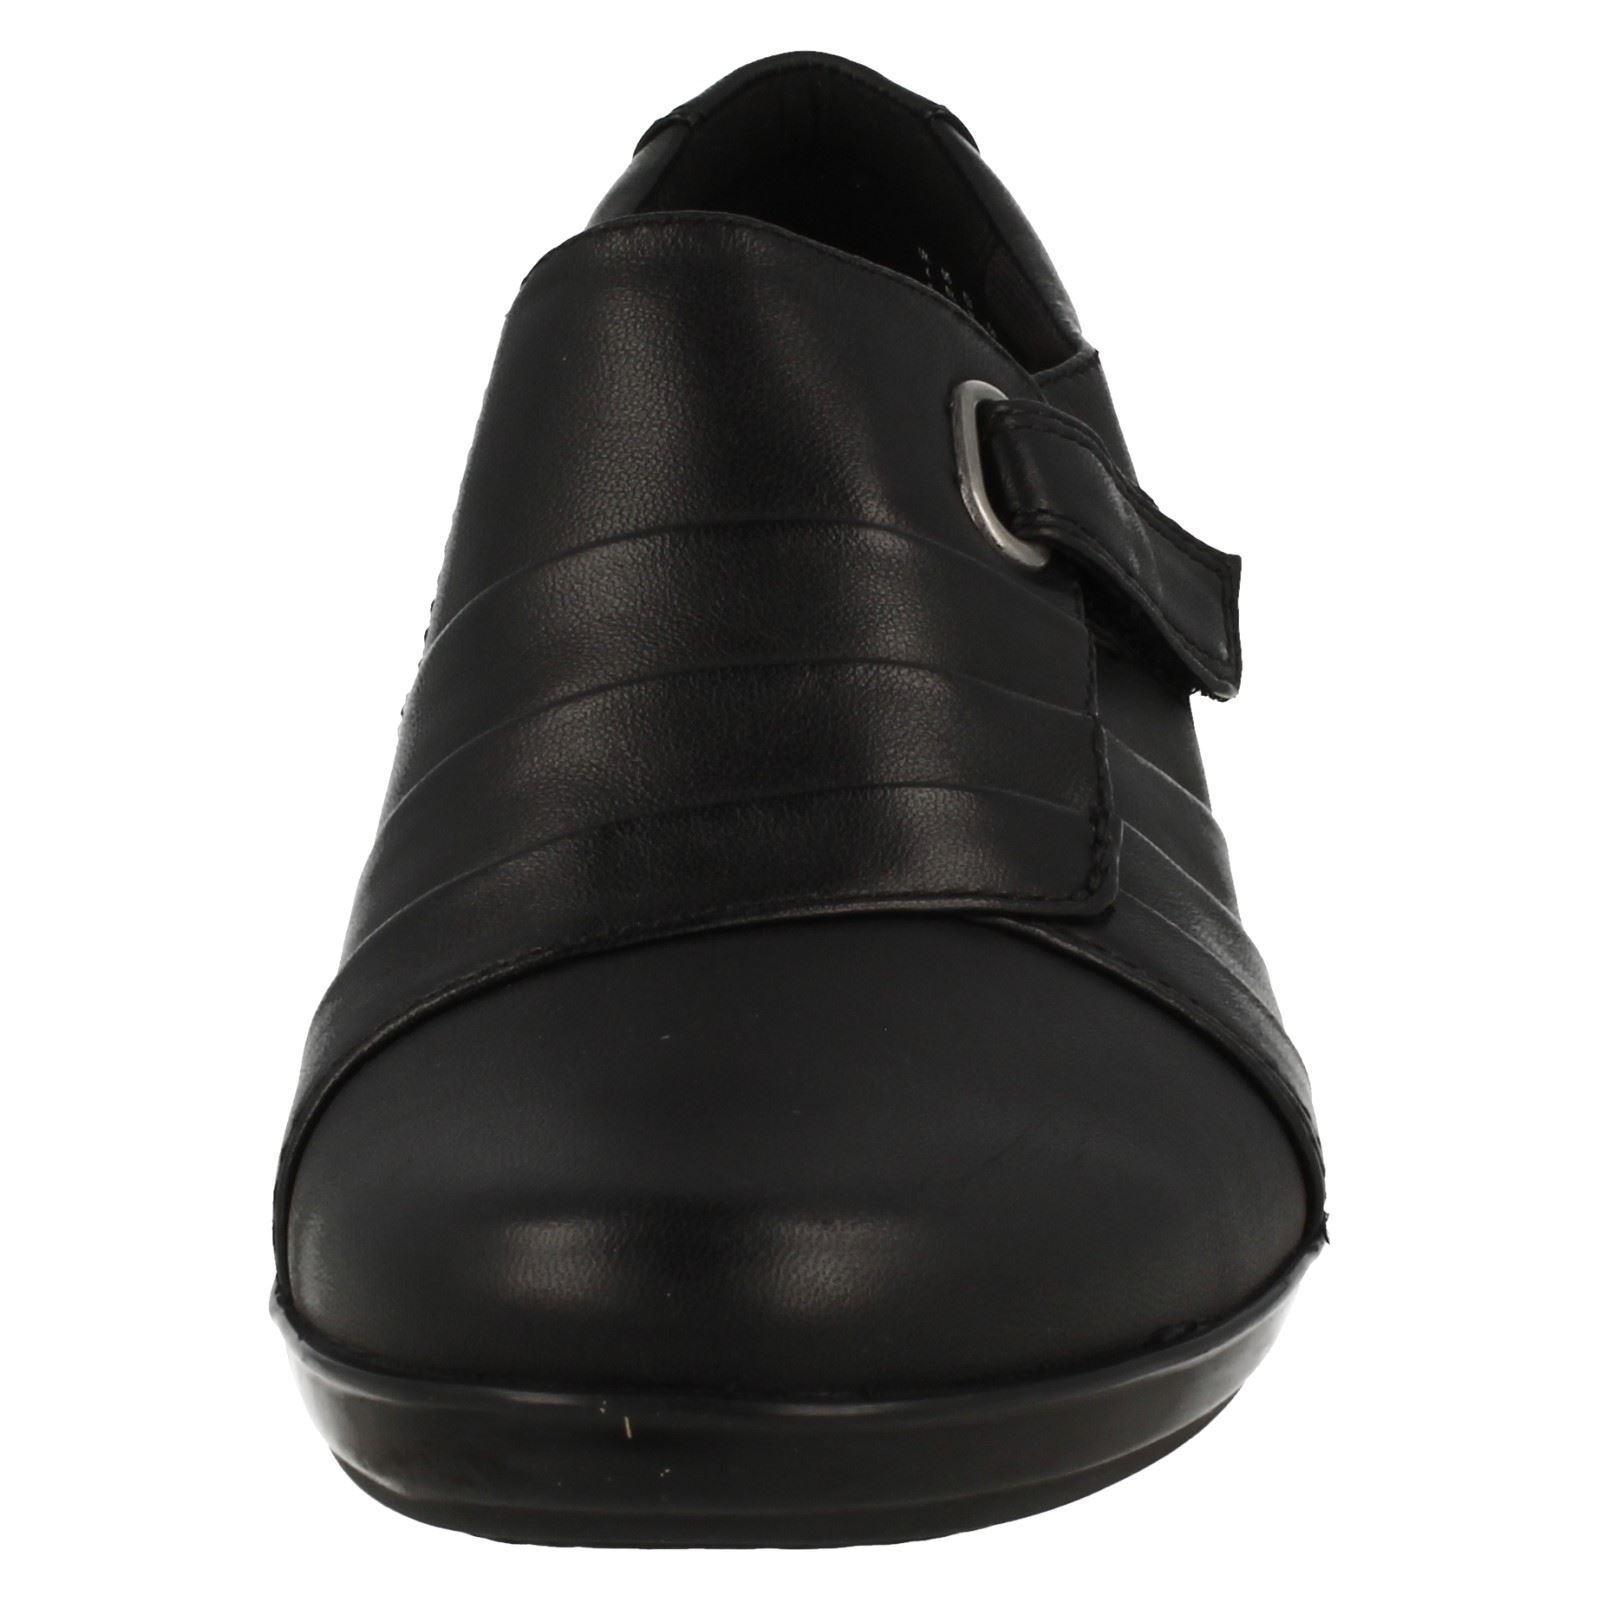 Ladies Clarks Hook And Loop Smart shoes Everlay Everlay Everlay Luna 55072d